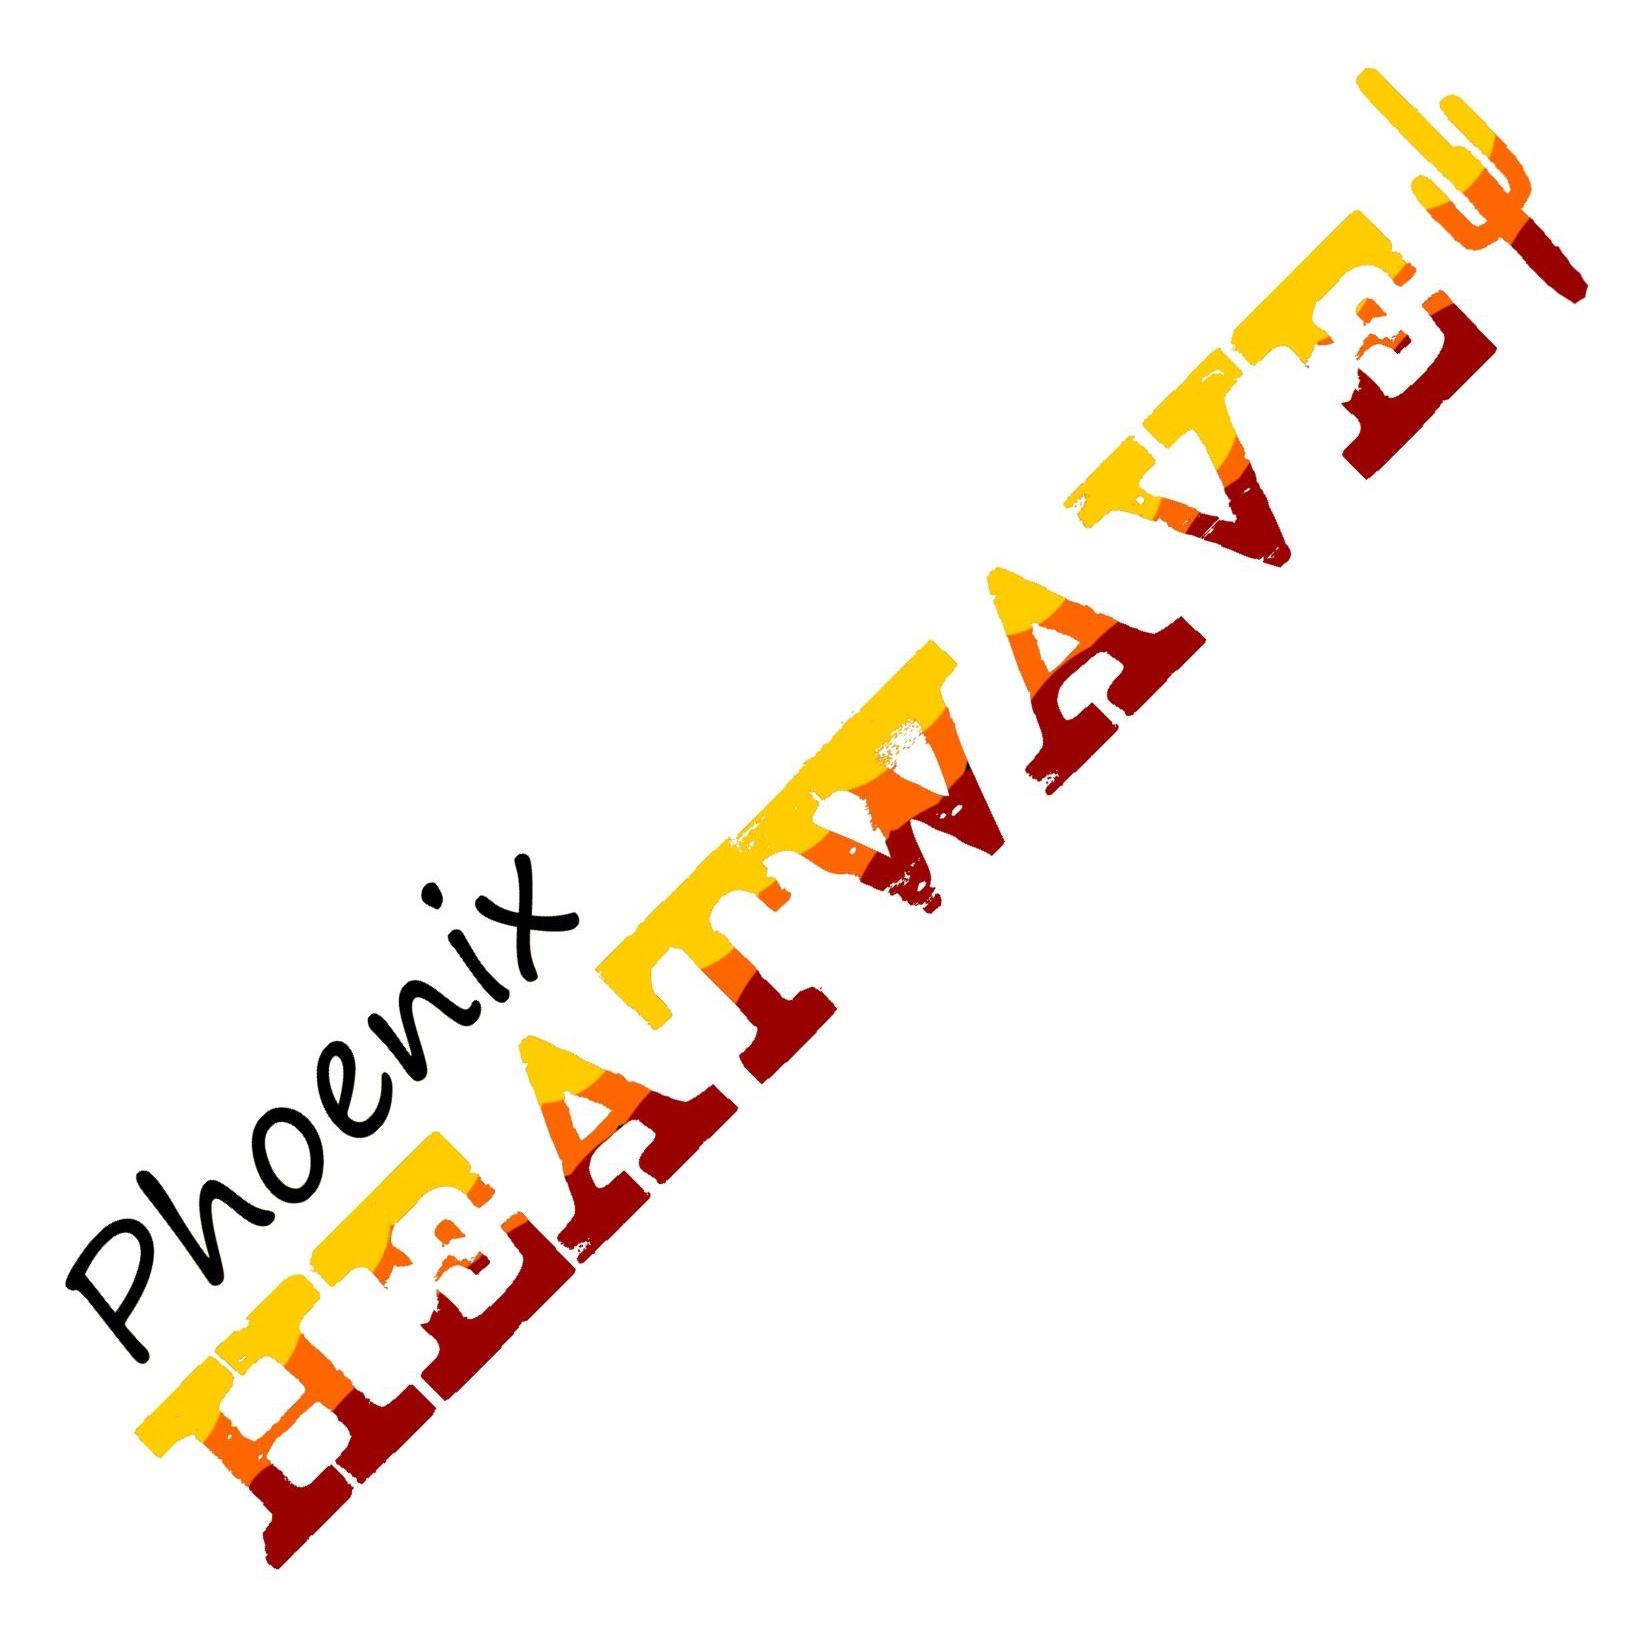 The Phoenix Heatwave